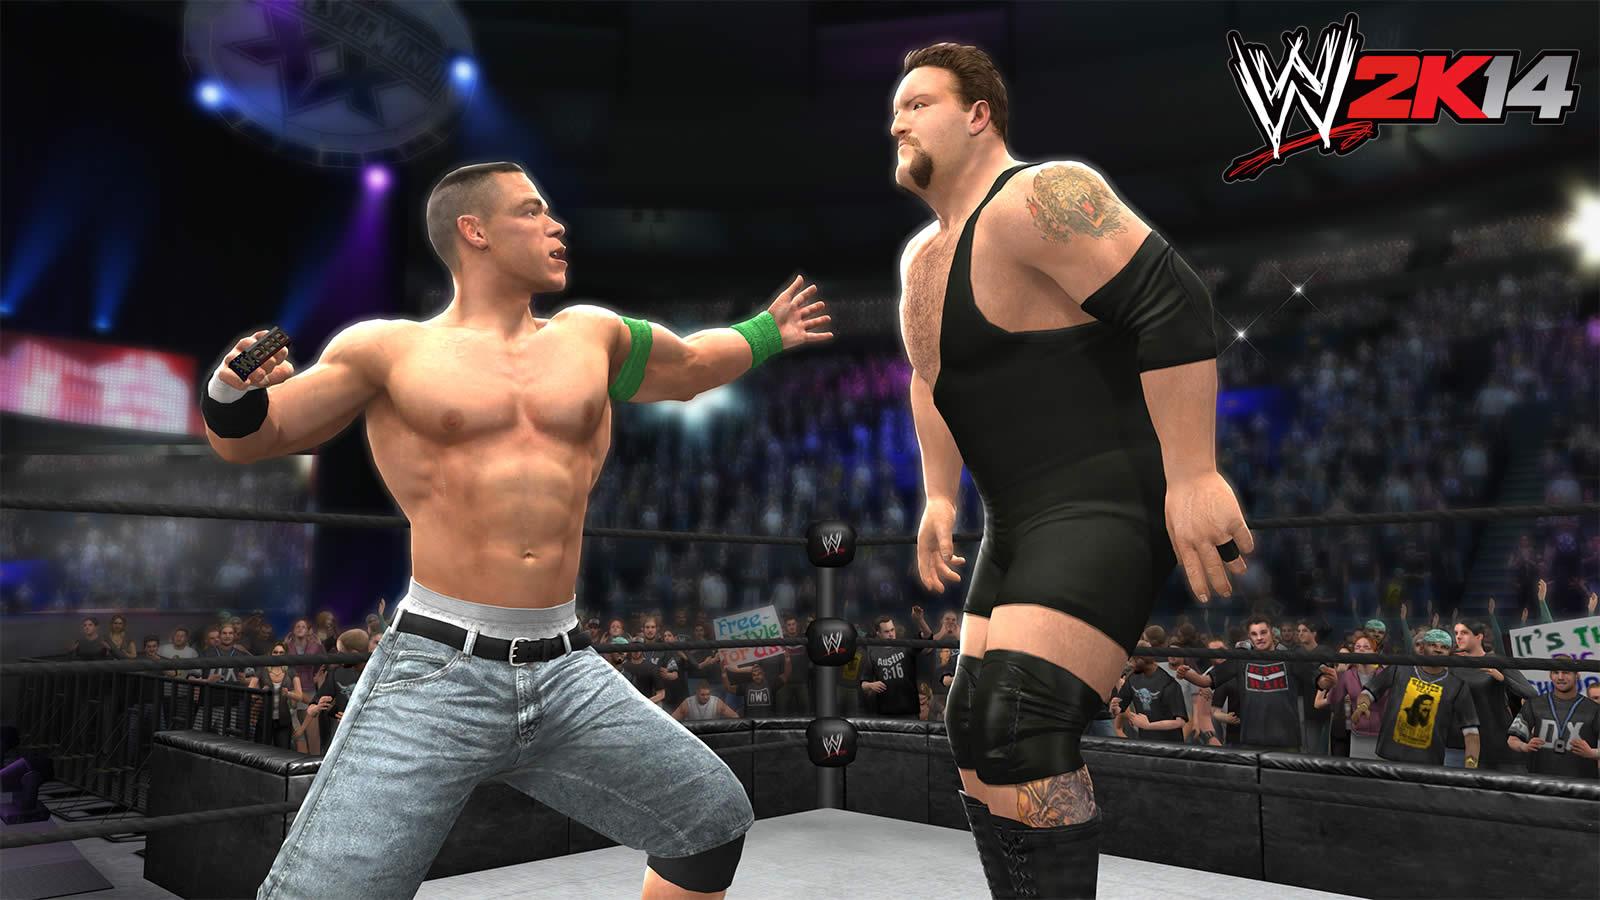 WWE 2K14 Screenshots WM20 Big Show vs John Cena by ThexRealxBanksWwe 2k14 Screenshots Goldberg